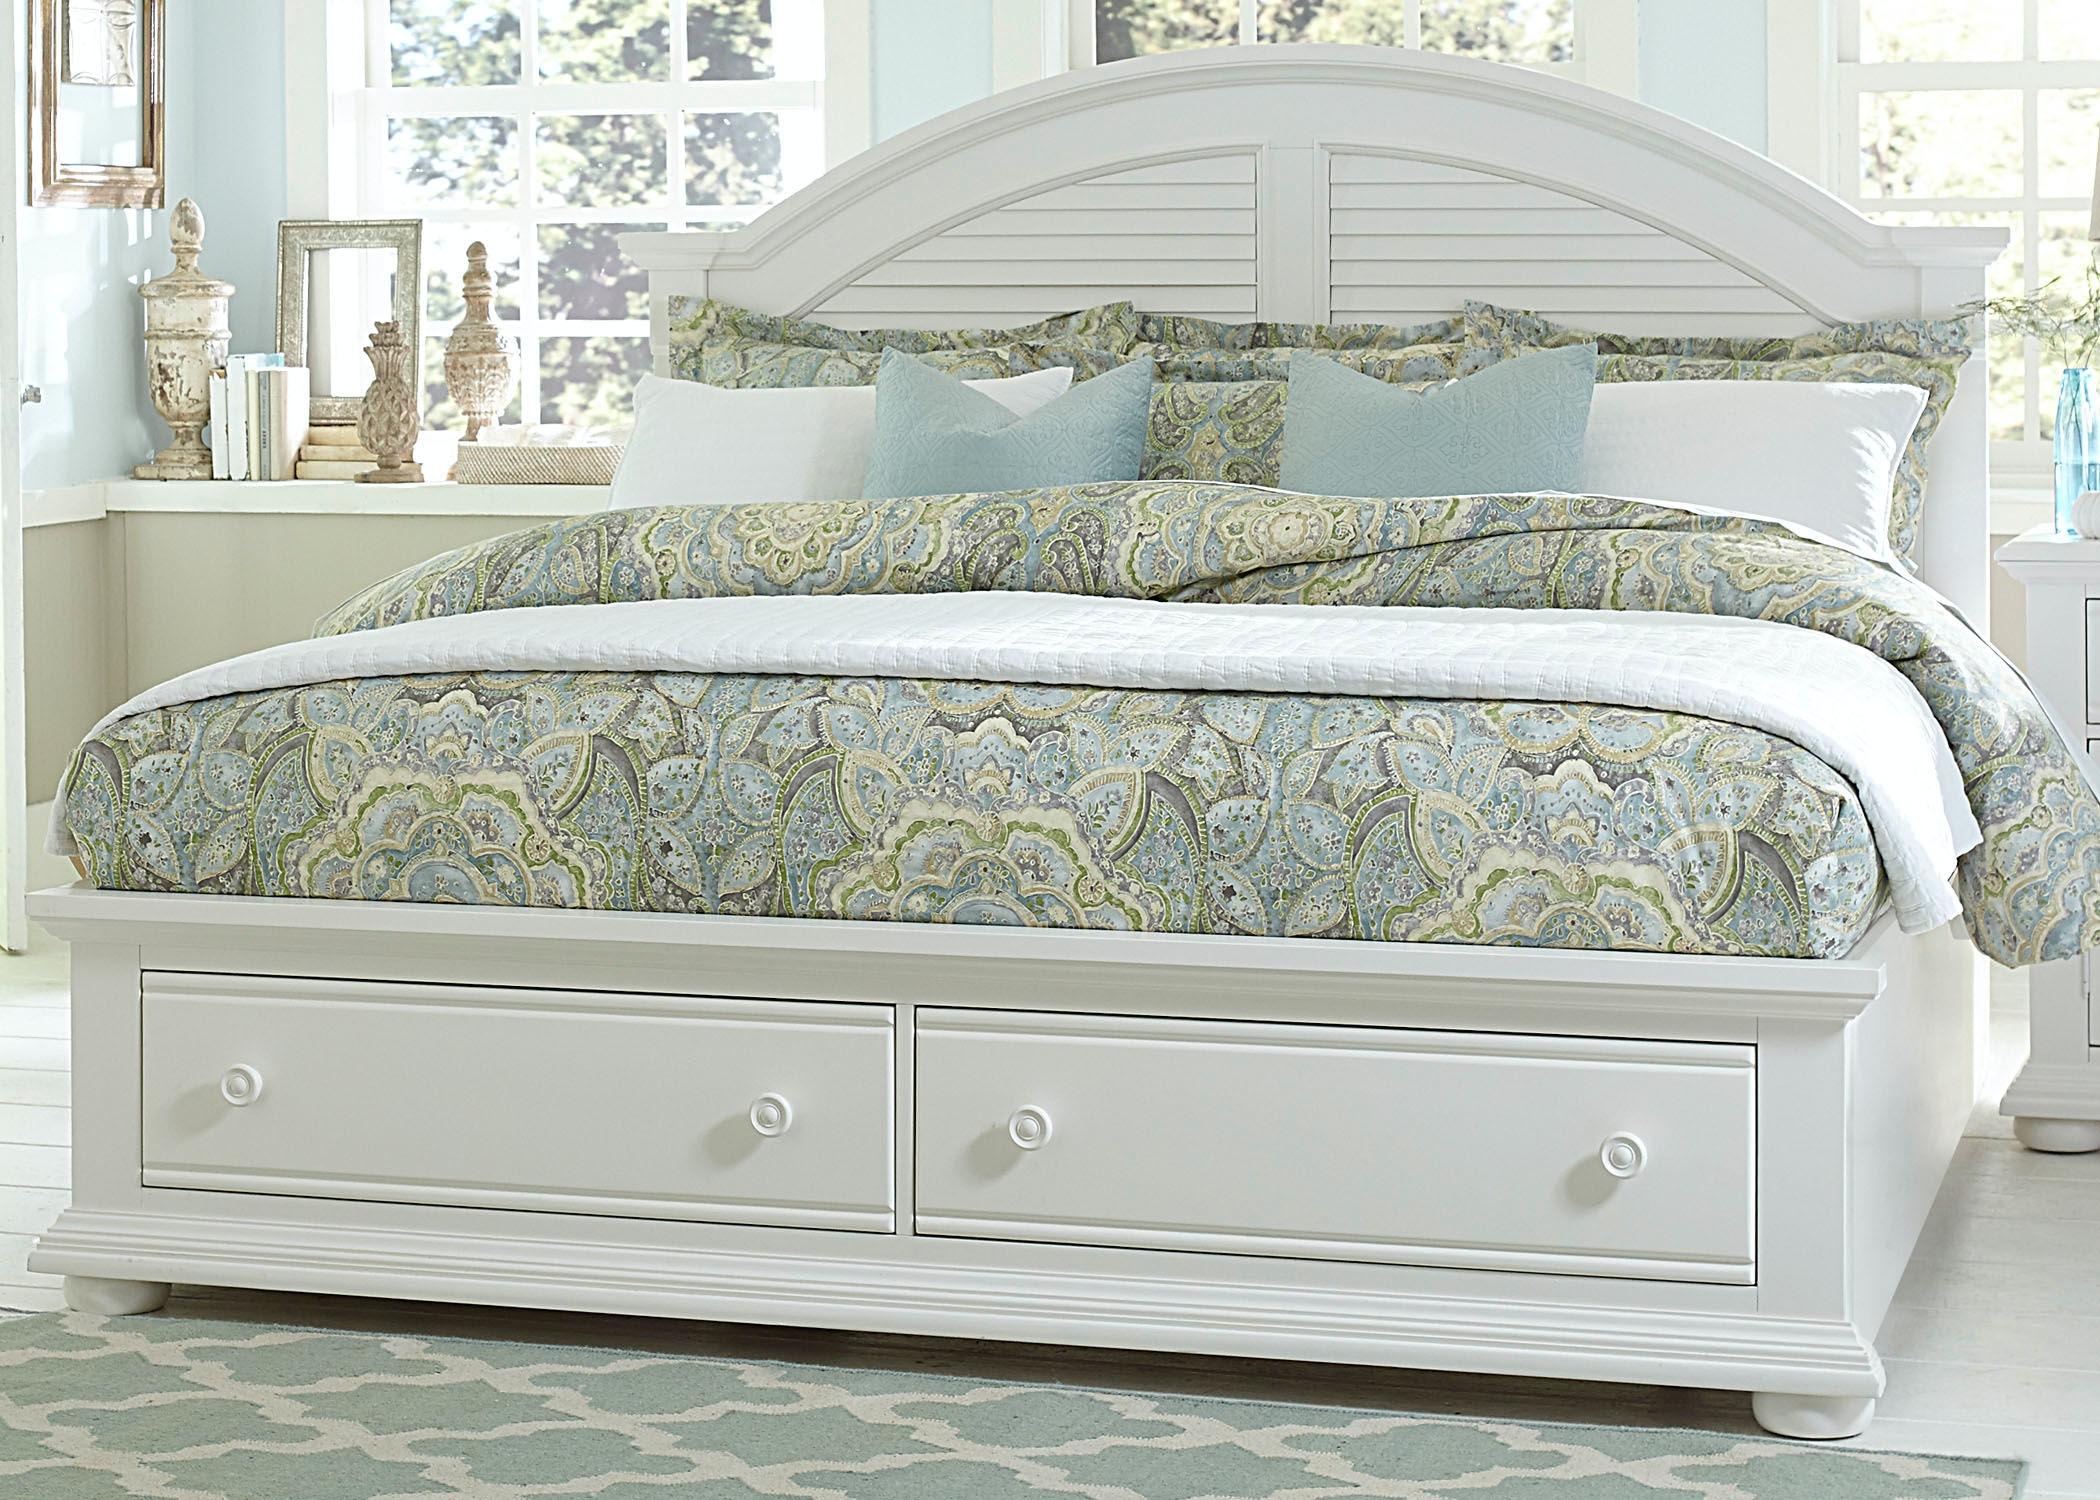 Liberty Furniture King Storage Bed 607 BR KSB ...